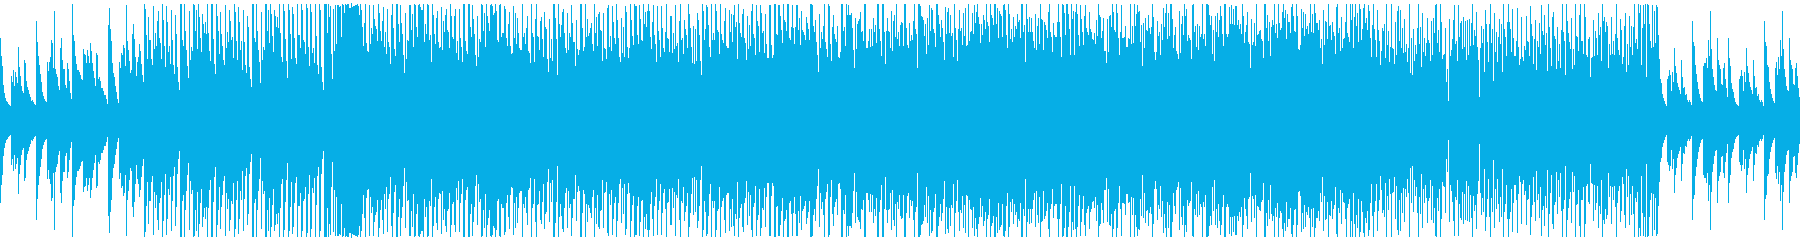 JAZZにEDMをMIXしたBGMの再生済みの波形